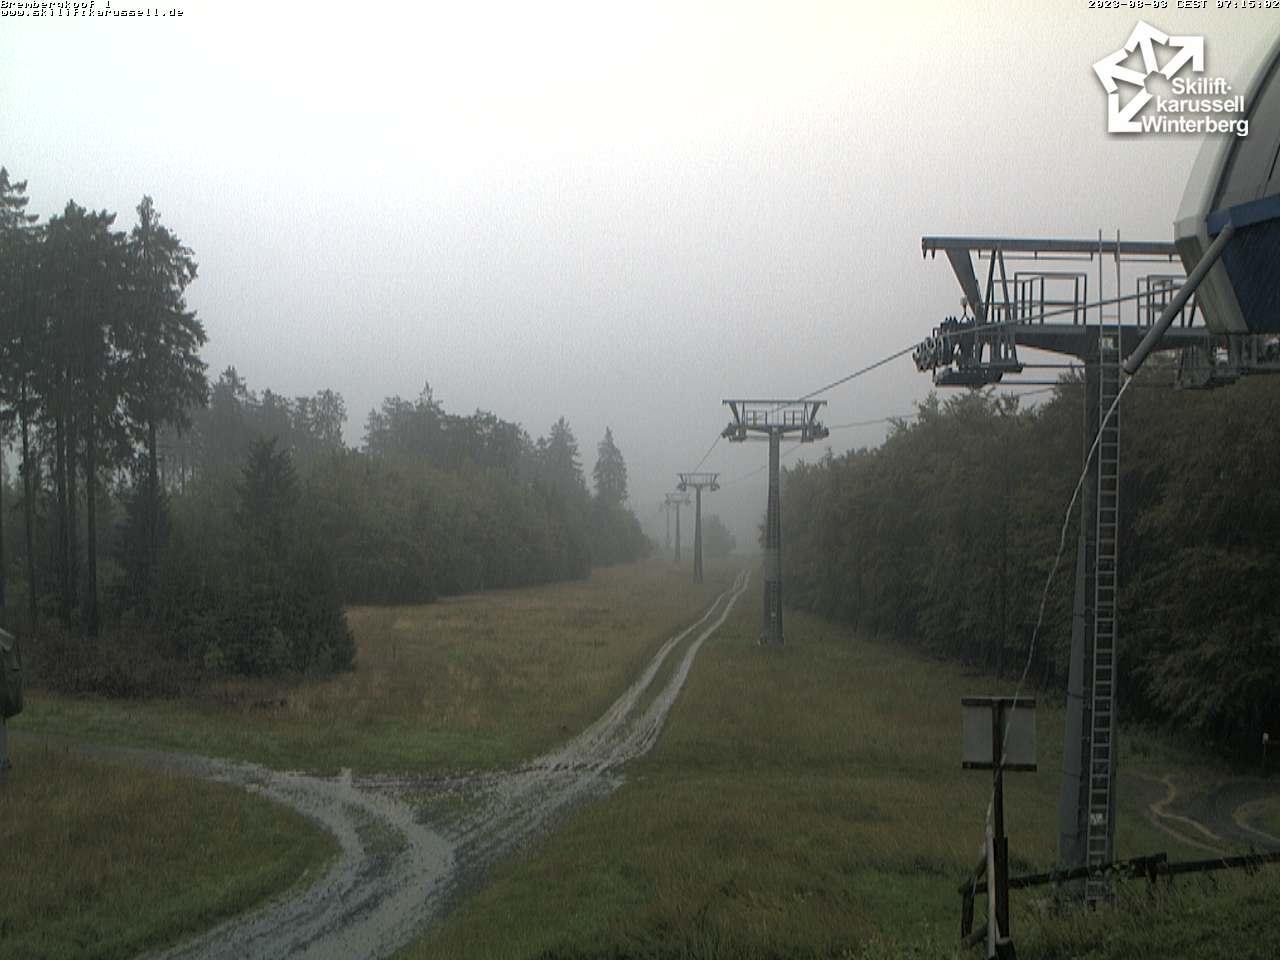 Skiliftkarussell Brembergkopf 1 6er Sesse Webcam